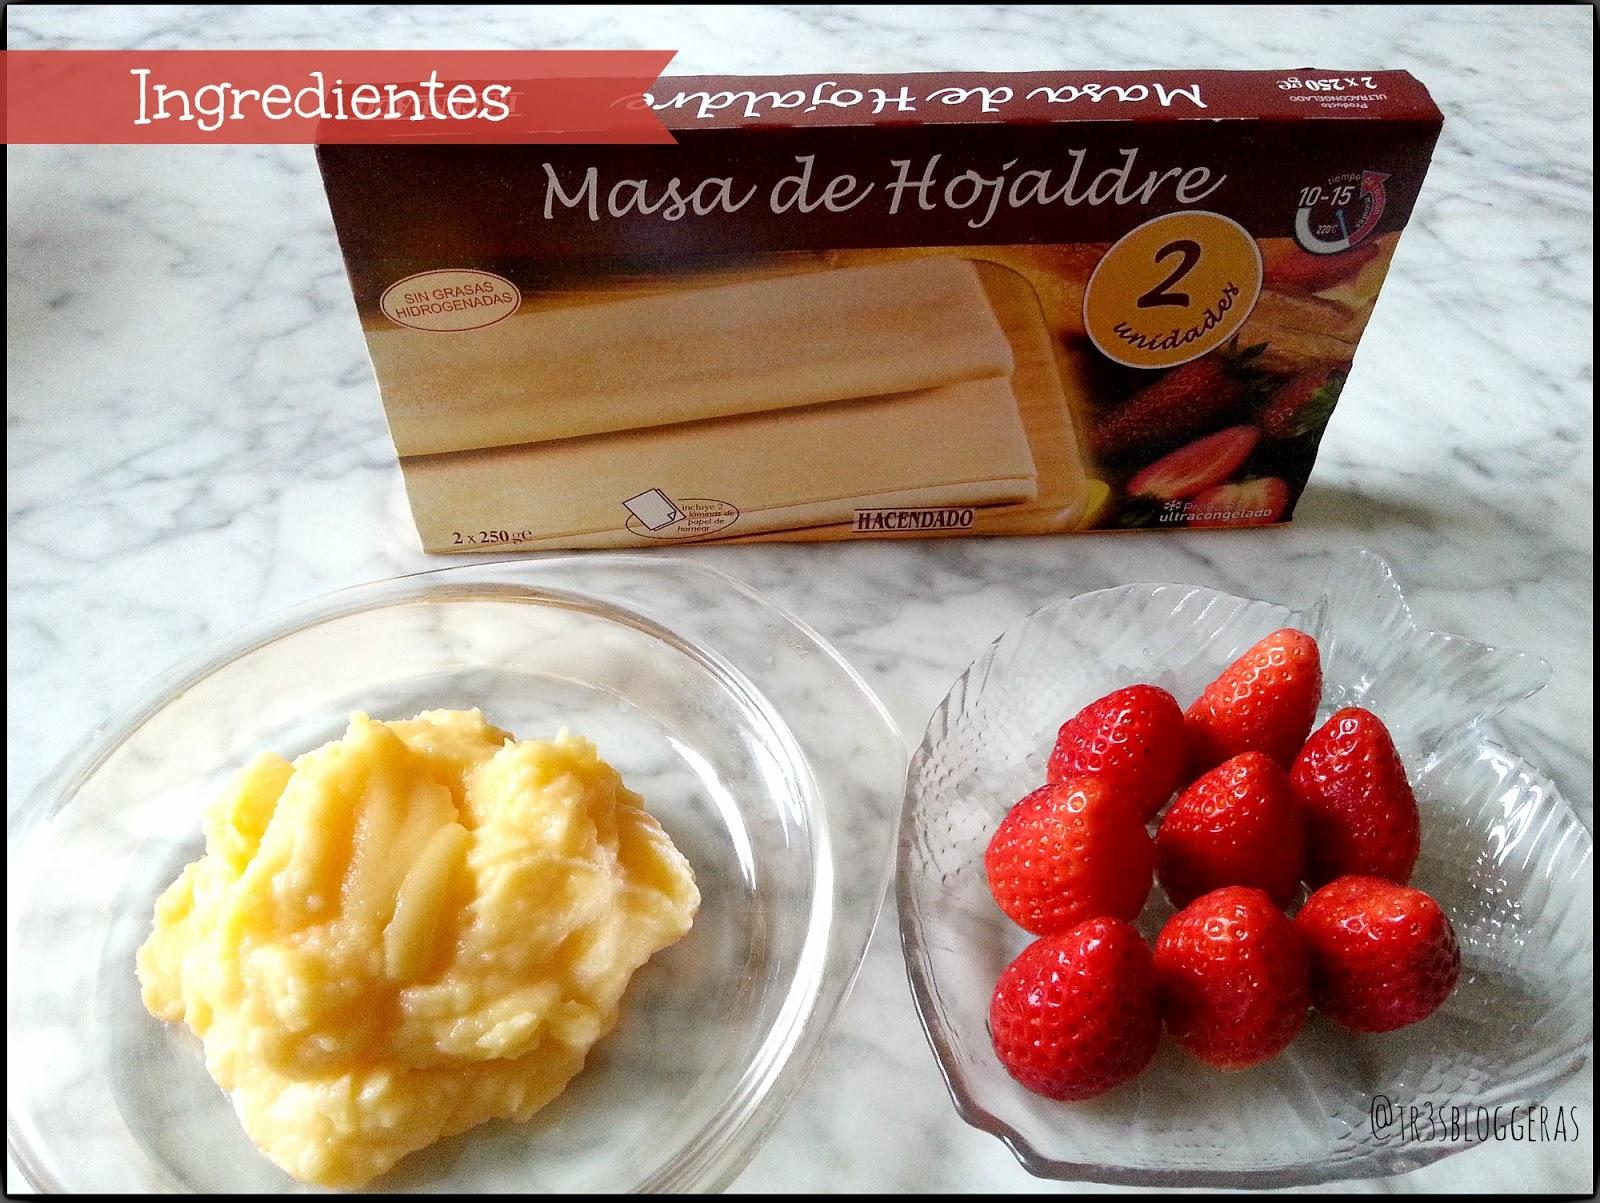 ingredientes strawberry cake - tarta hojaldre rellena de crema y fresas San Valentín